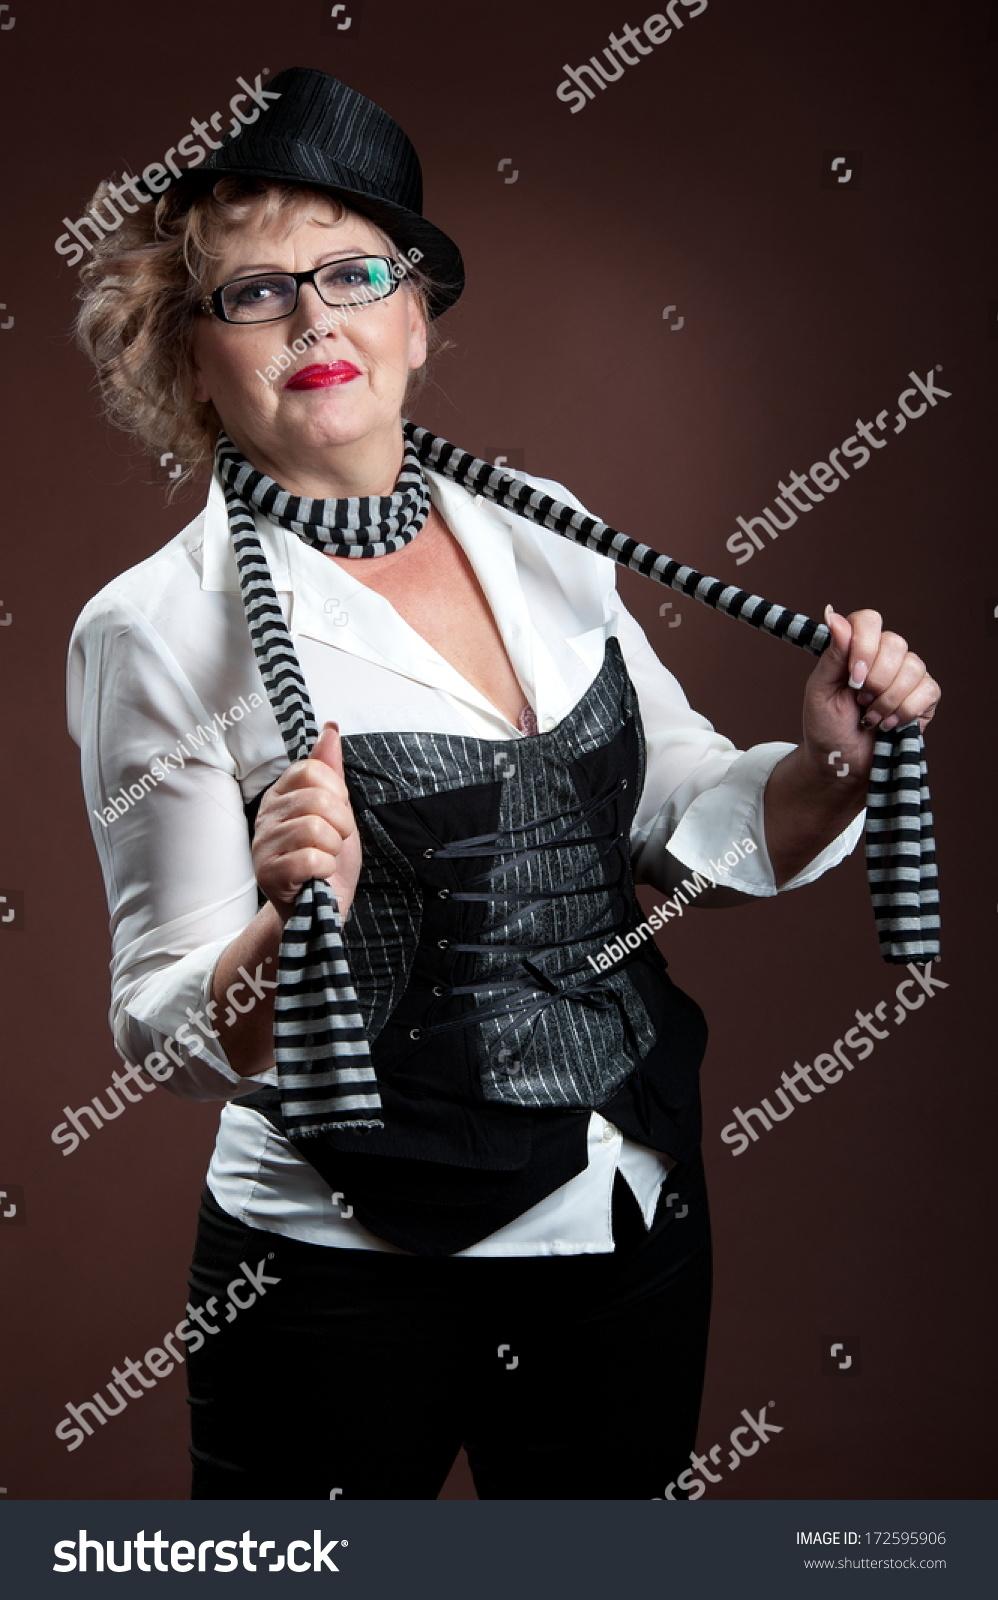 Elderly Woman Portrait In Retro Style Stock Photo 172595906 ...